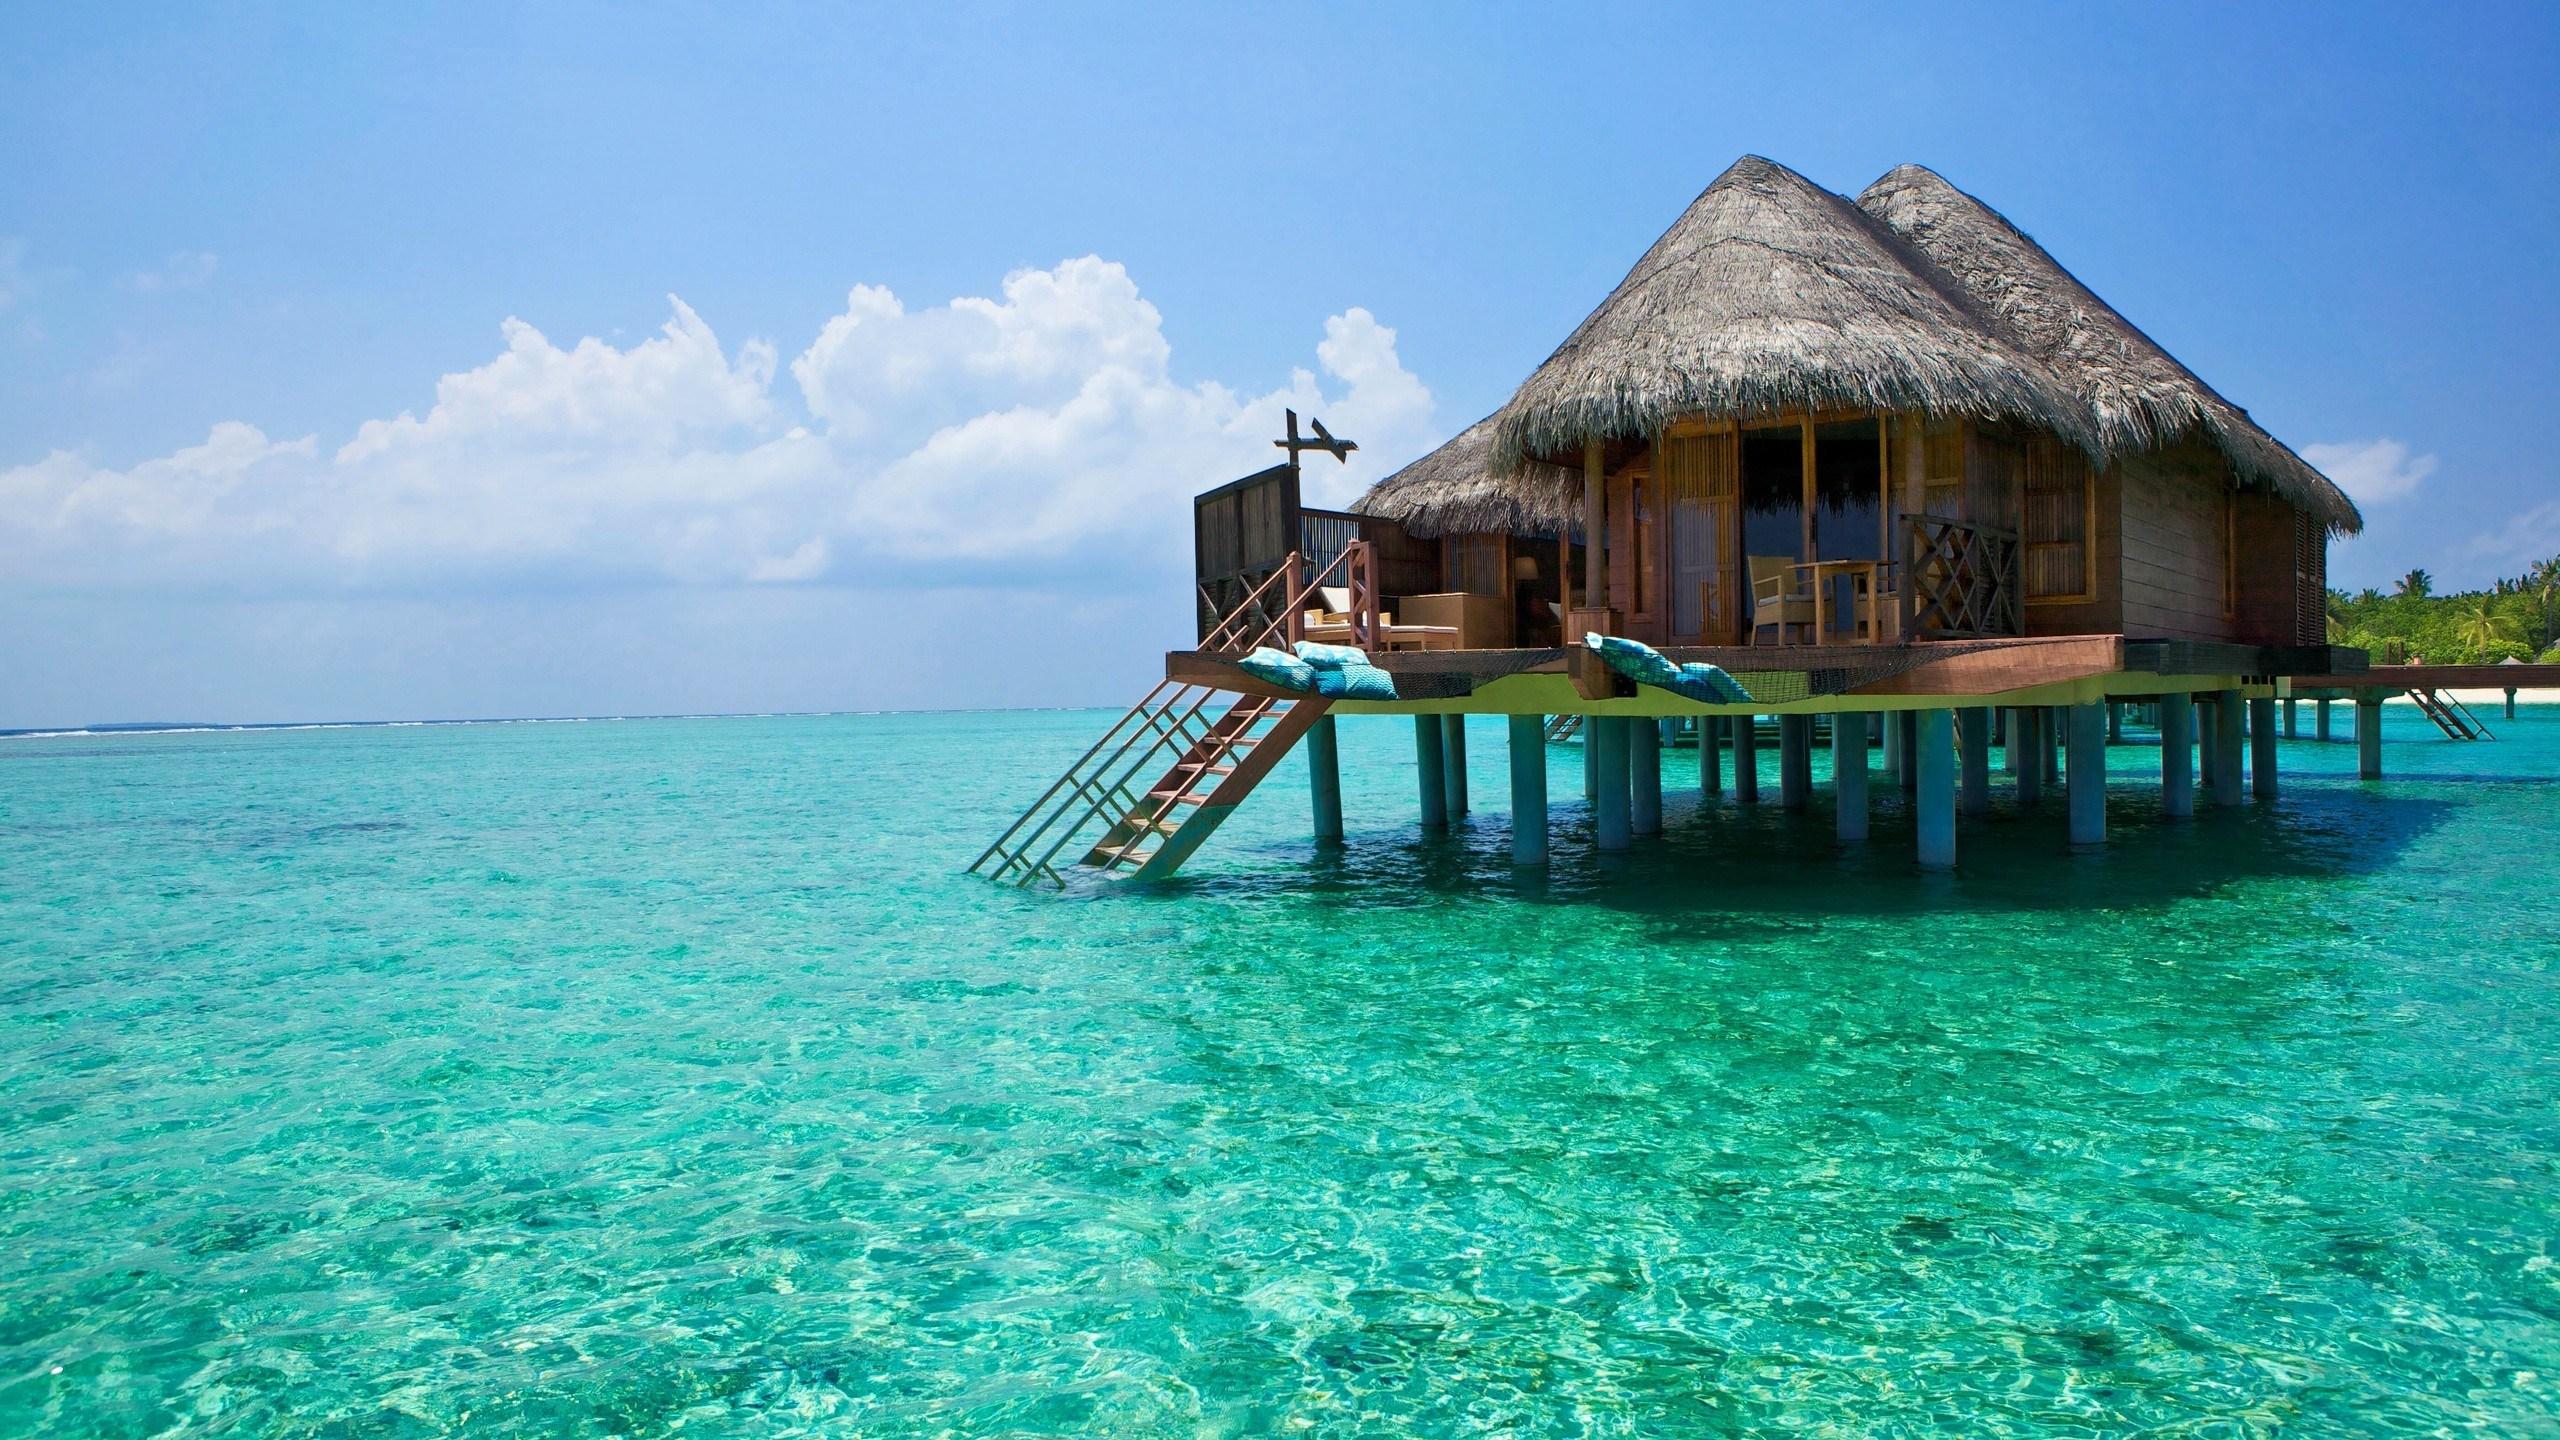 Bali Island Ocean 2560 X 1440